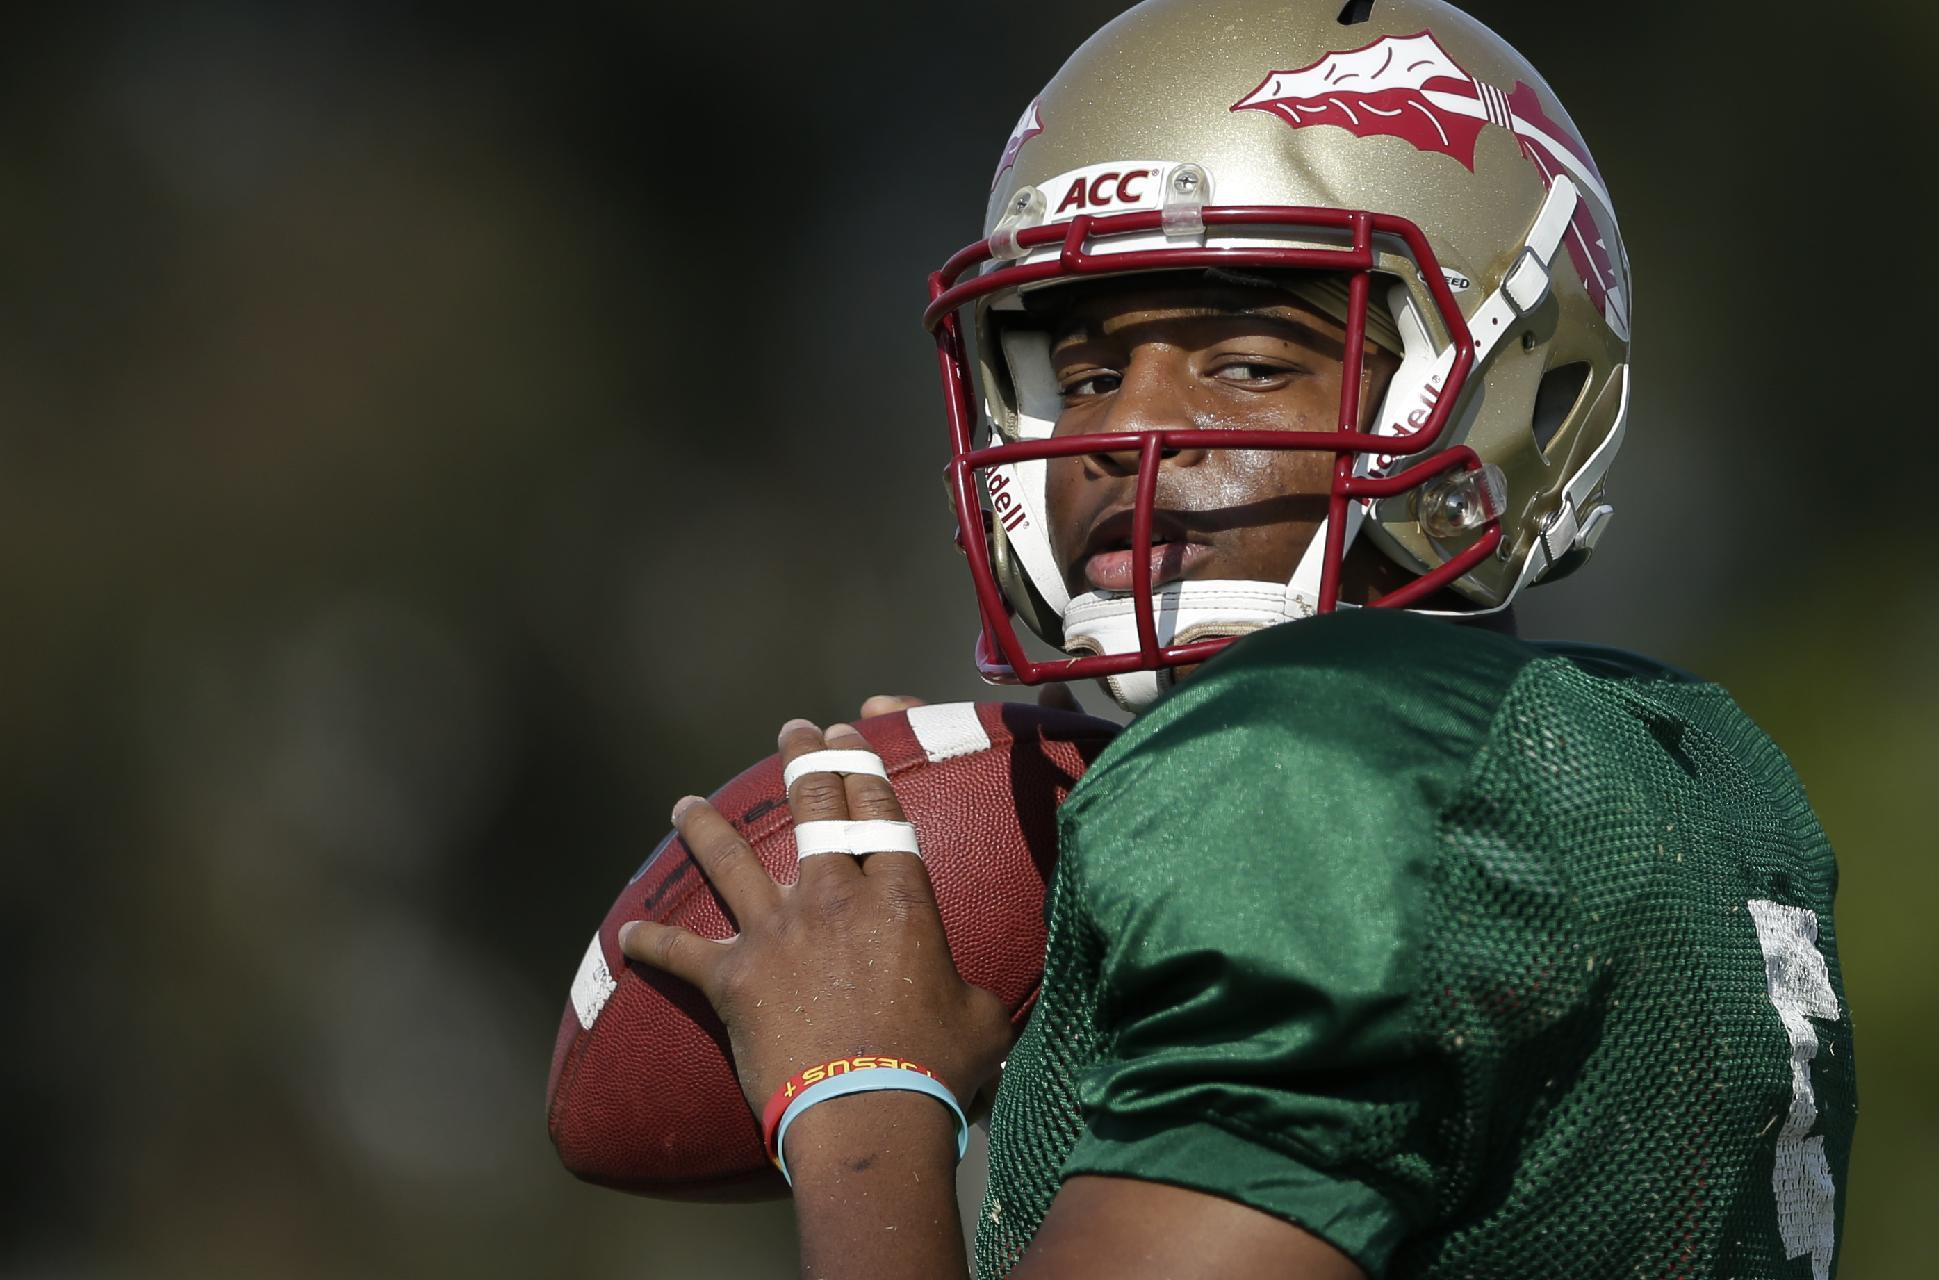 Florida State quarterback Jameis Winston will not play ...